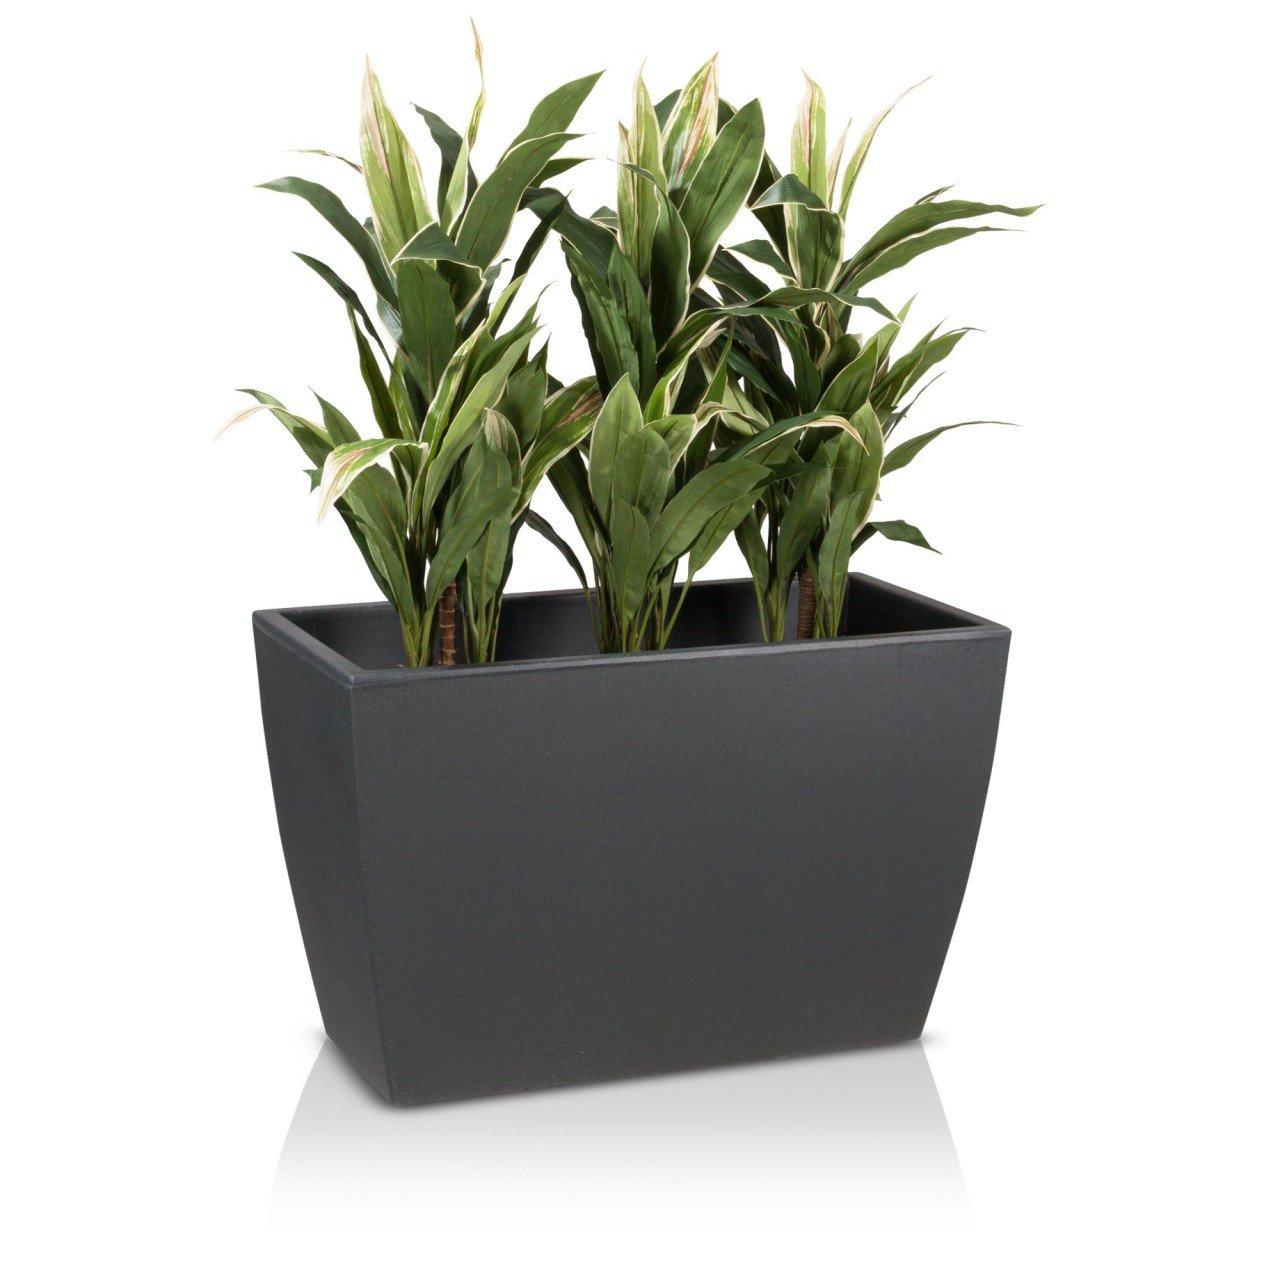 Pflanztrog Blumentrog ARTESA 50 Kunststoff, 80x40x50 cm, anthrazit matt